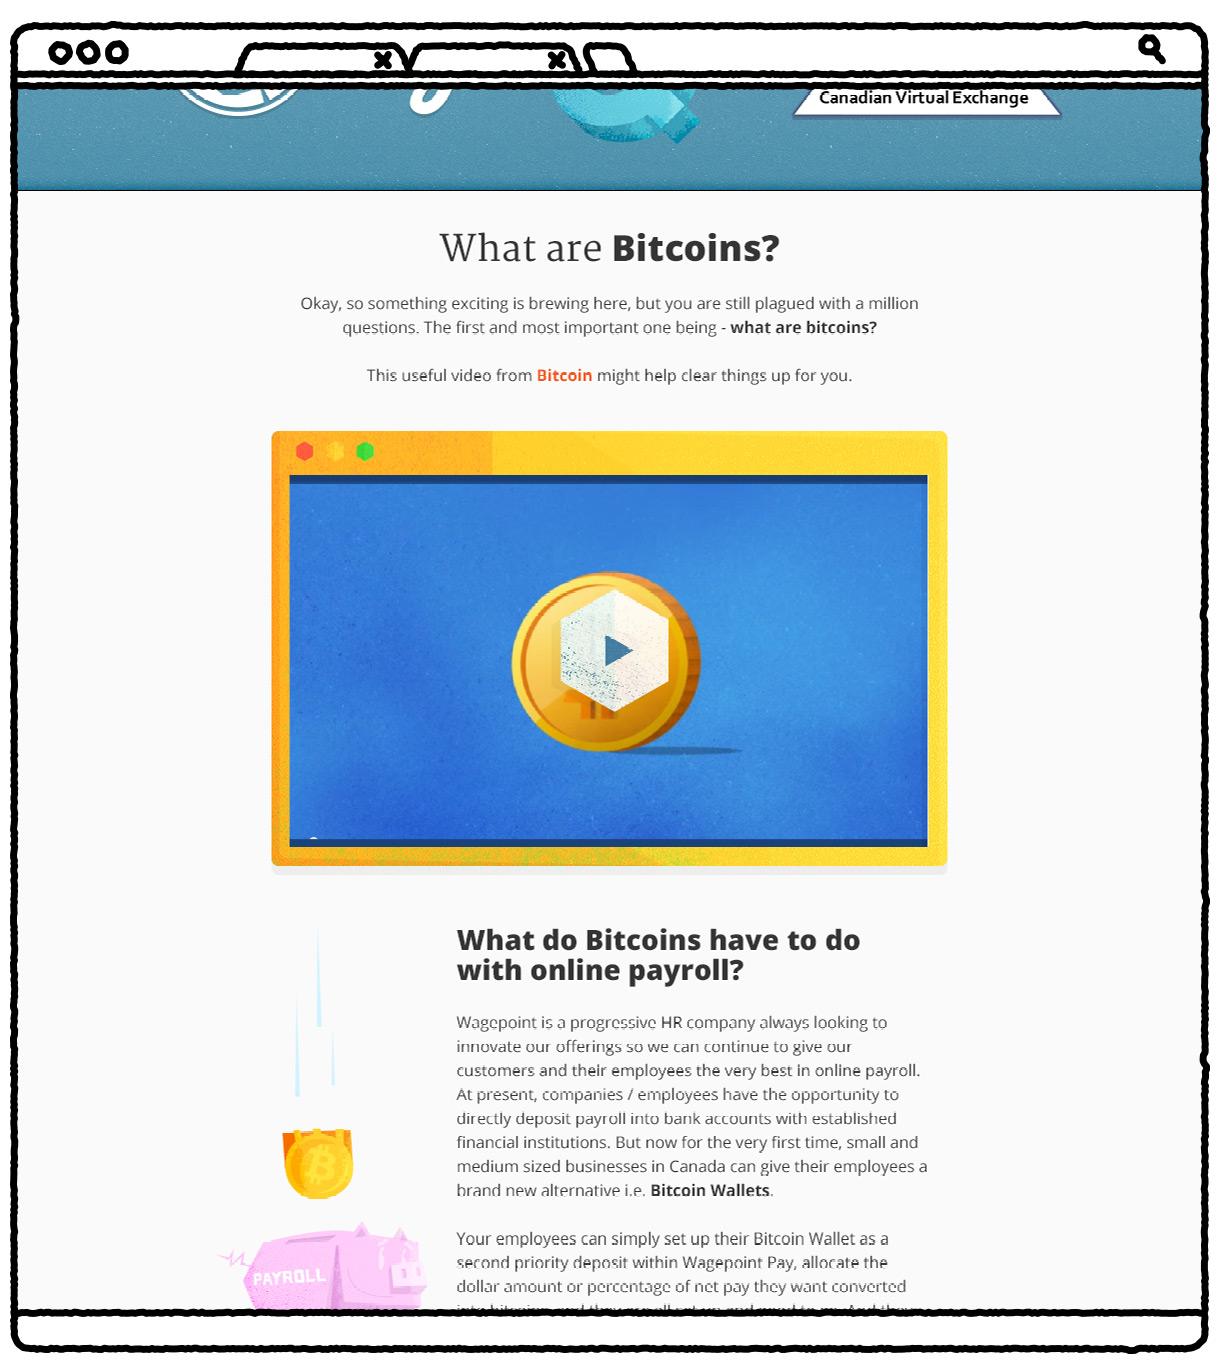 wagepoint-bitcoin.jpg